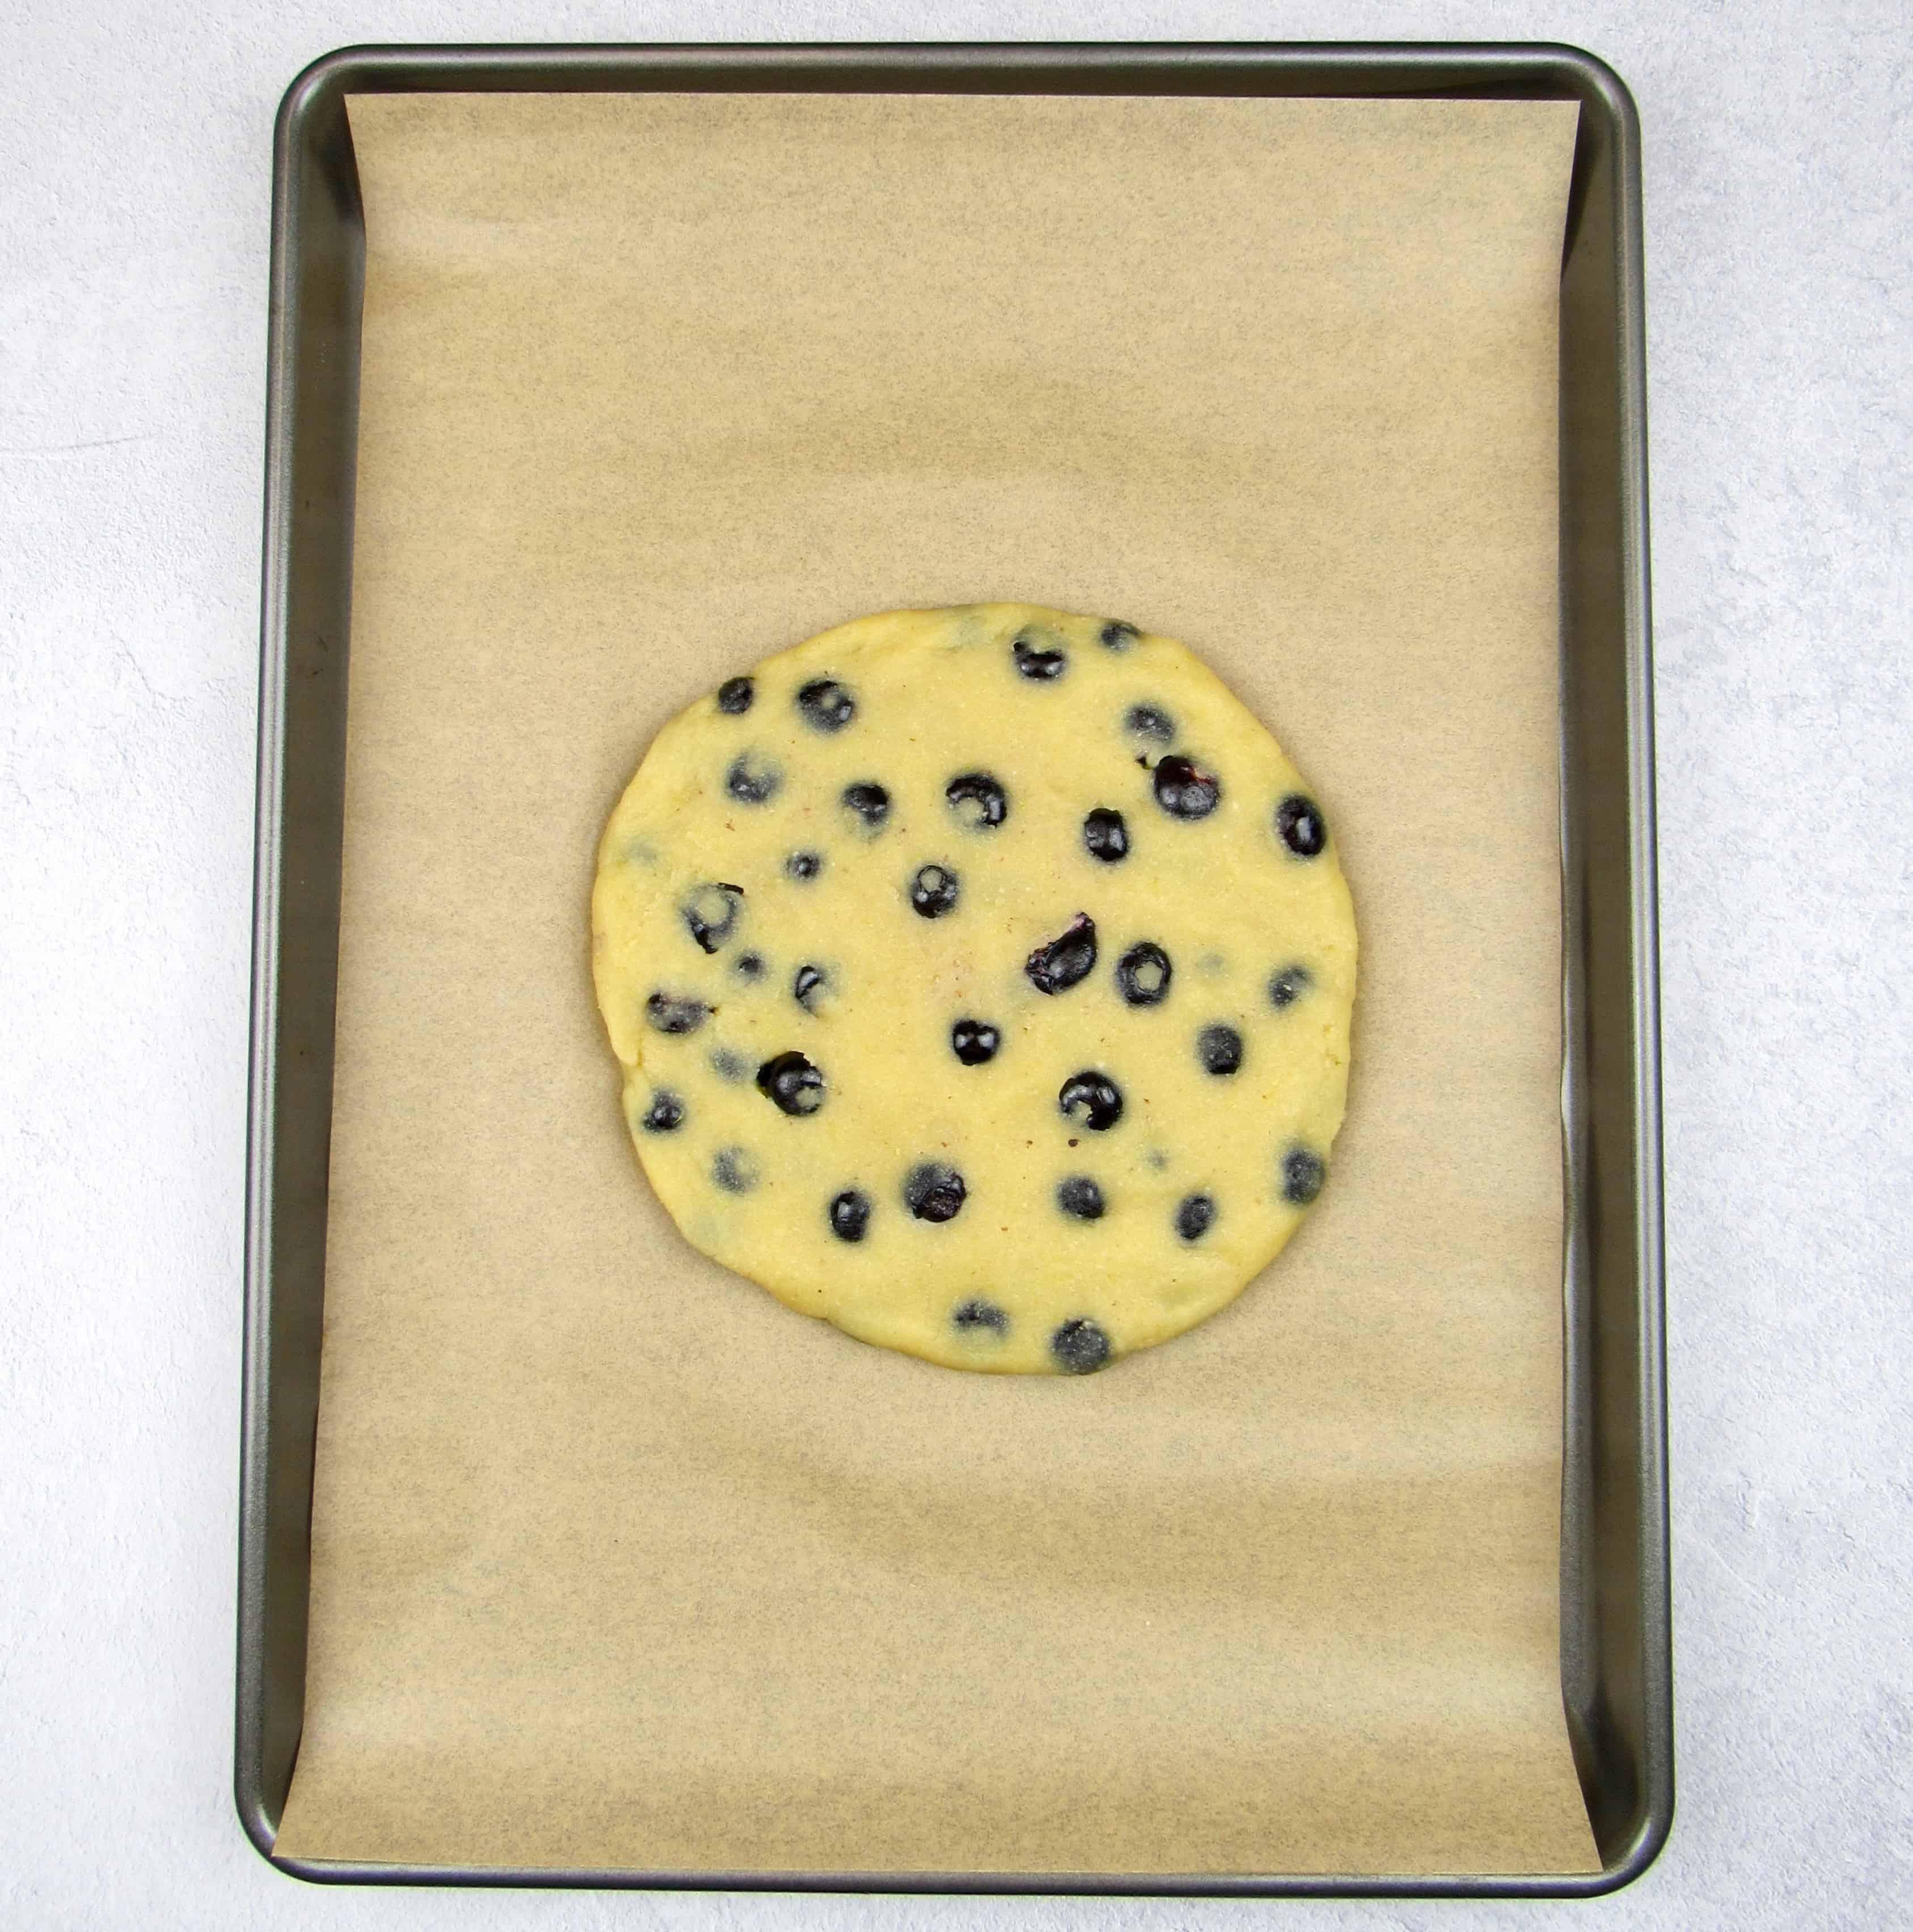 blueberry lemon scones dough disc on sheet pan